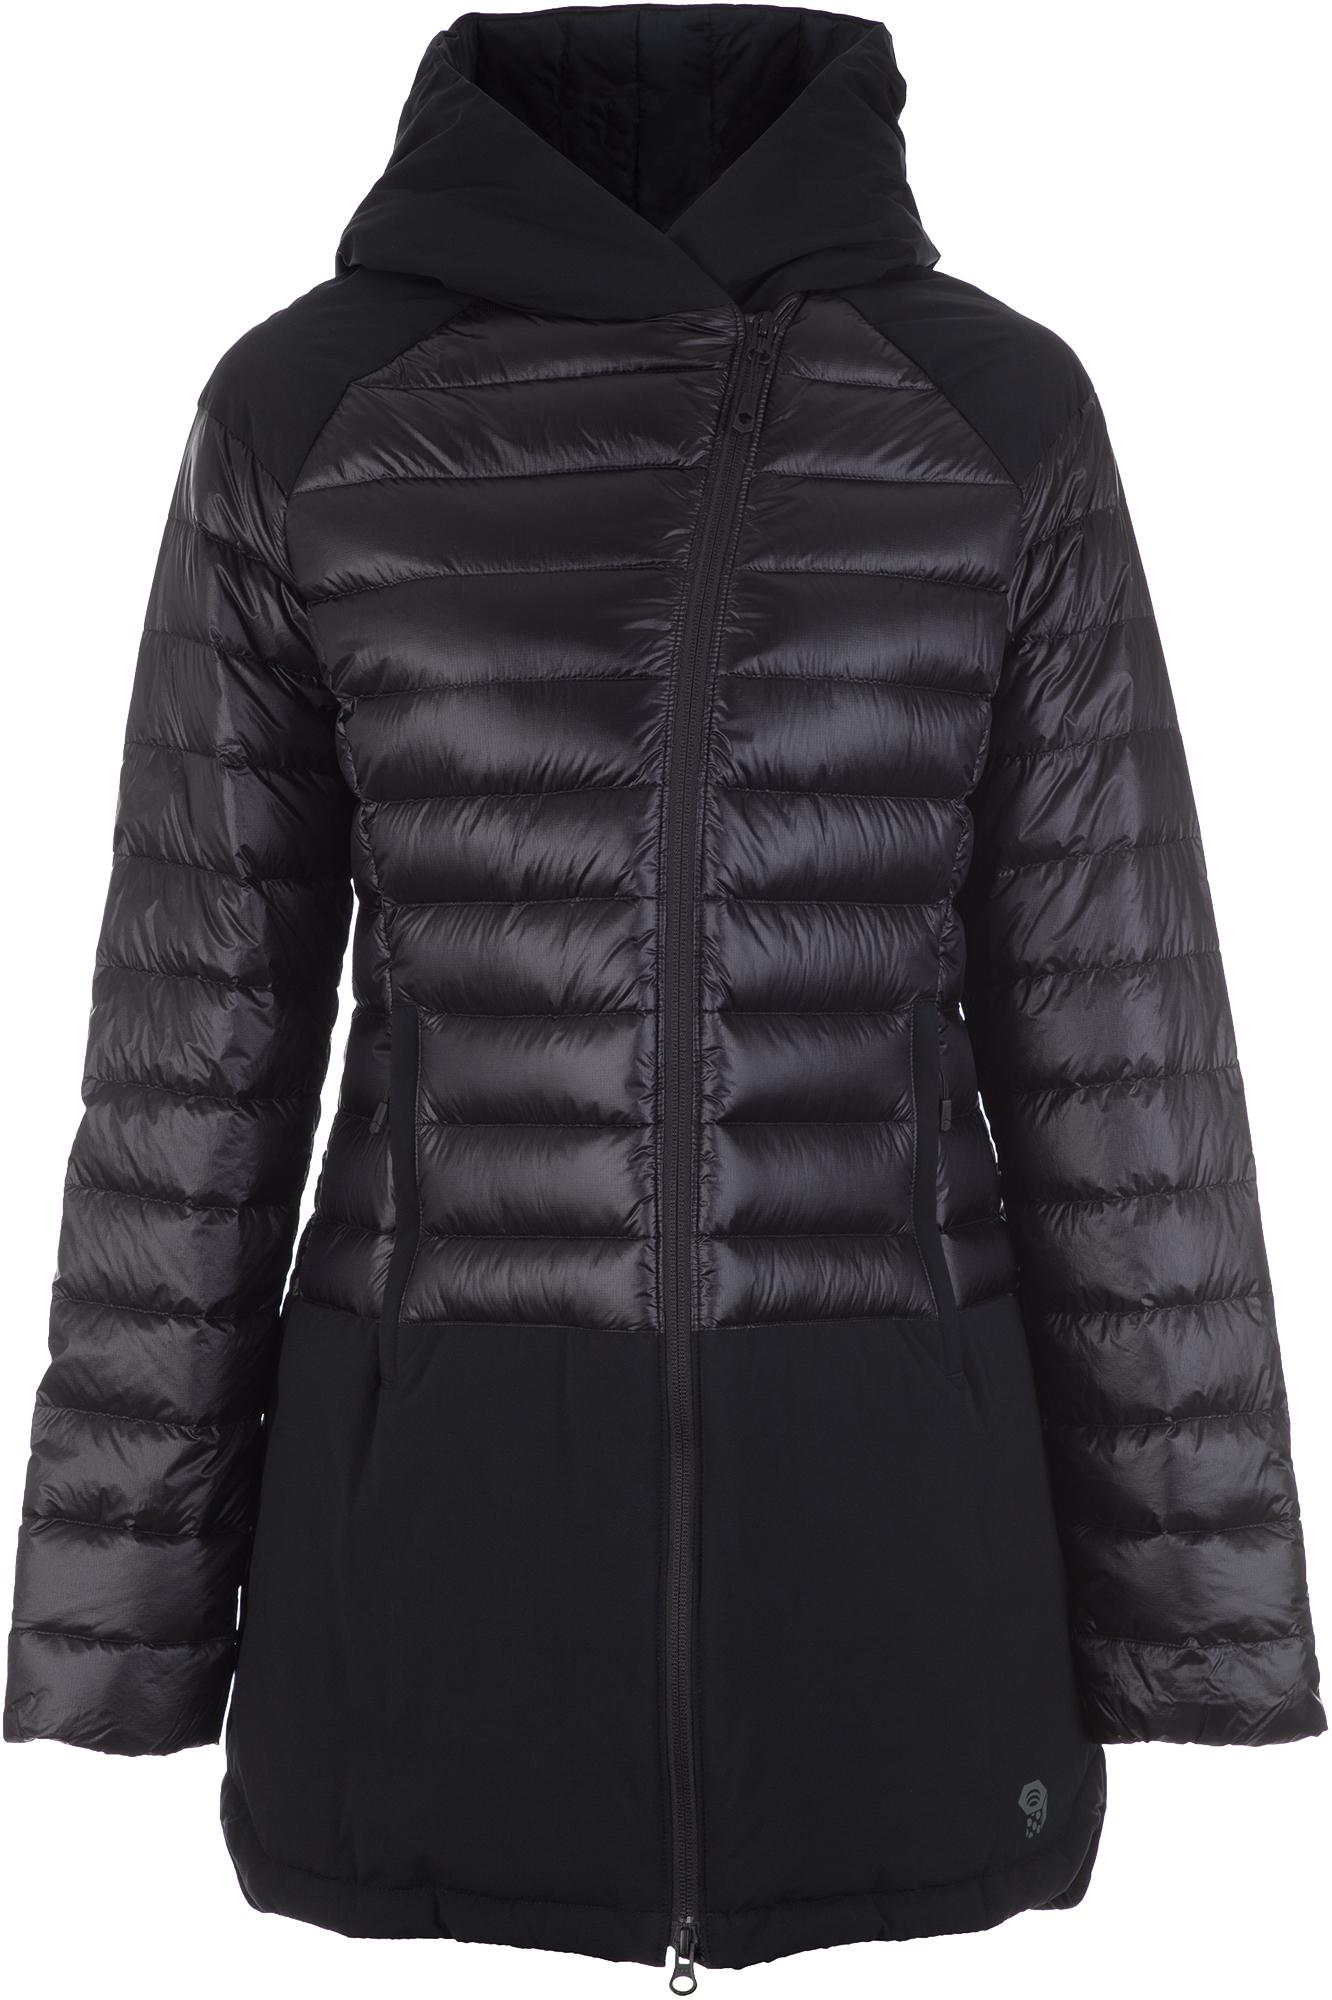 Mountain Hardwear Куртка пуховая женская Mountain Hardwear Funnel, размер 46